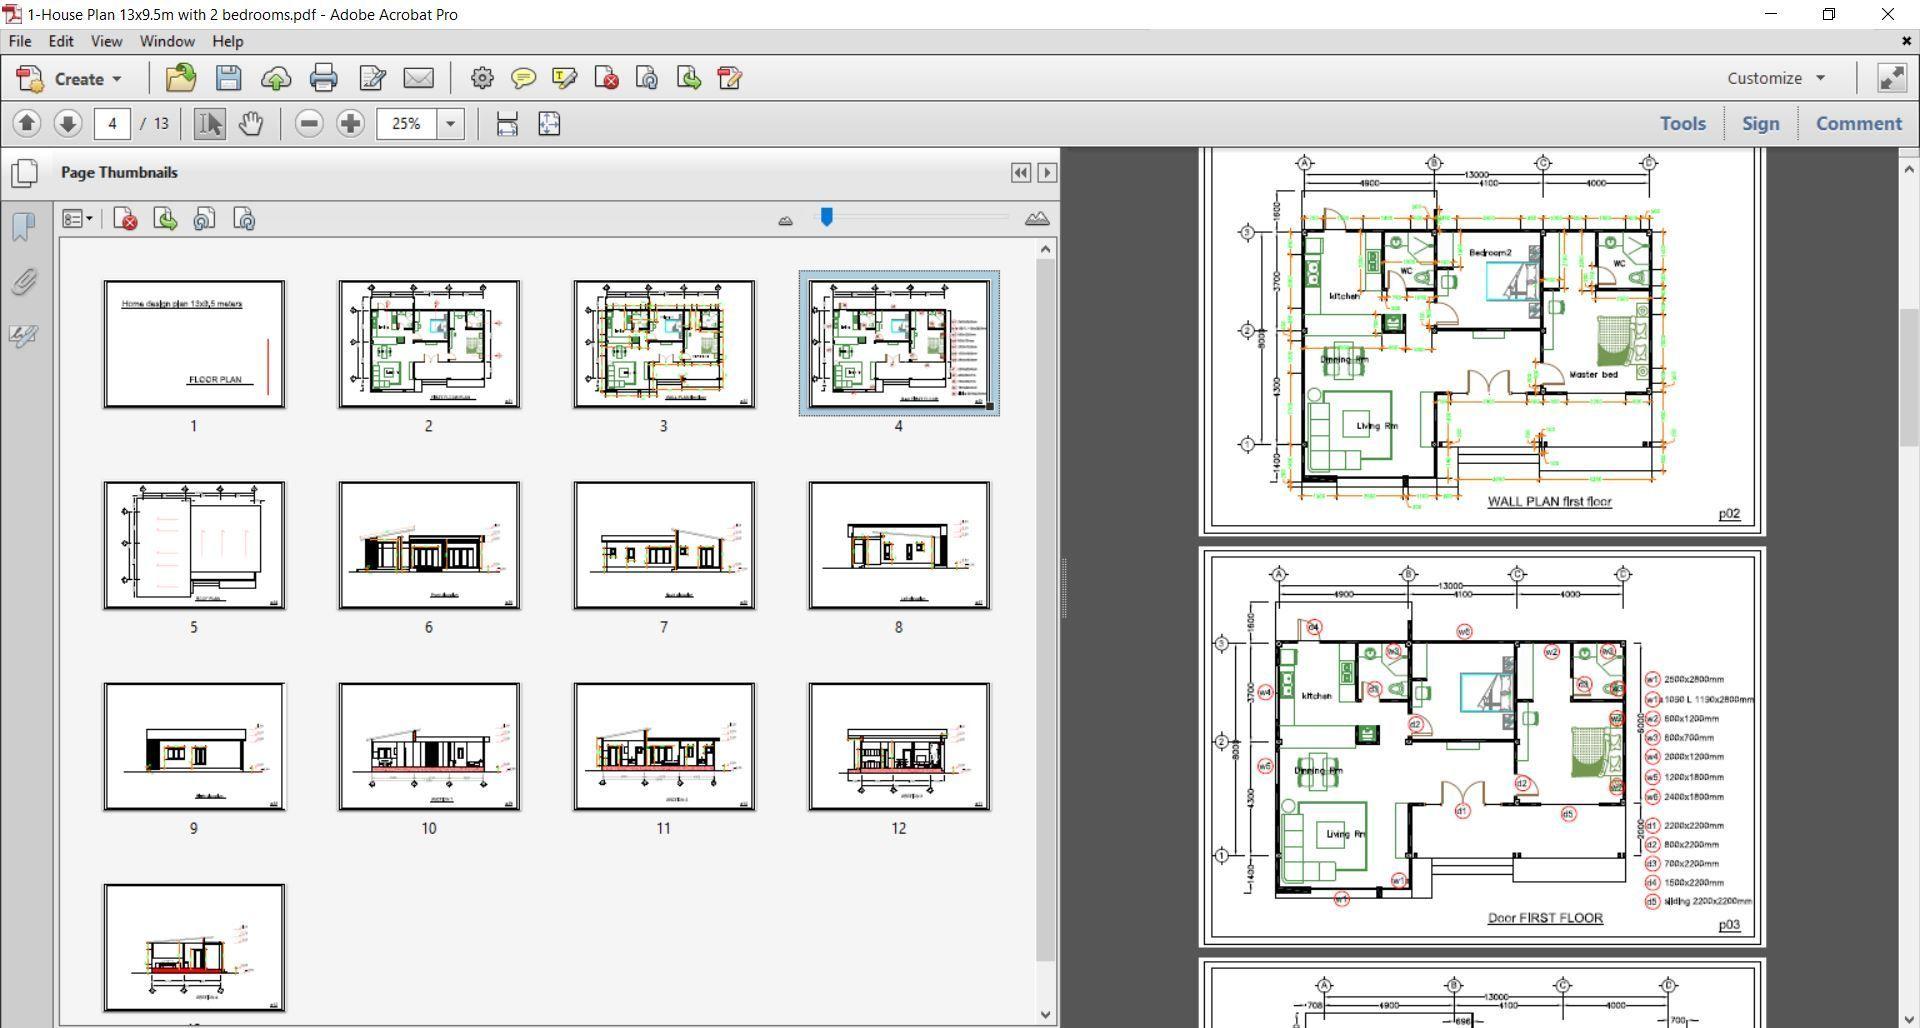 House Plans 13x9 5m Full Plan 2beds House Plans Free Downloads House Design 3d Interior Design House Plans